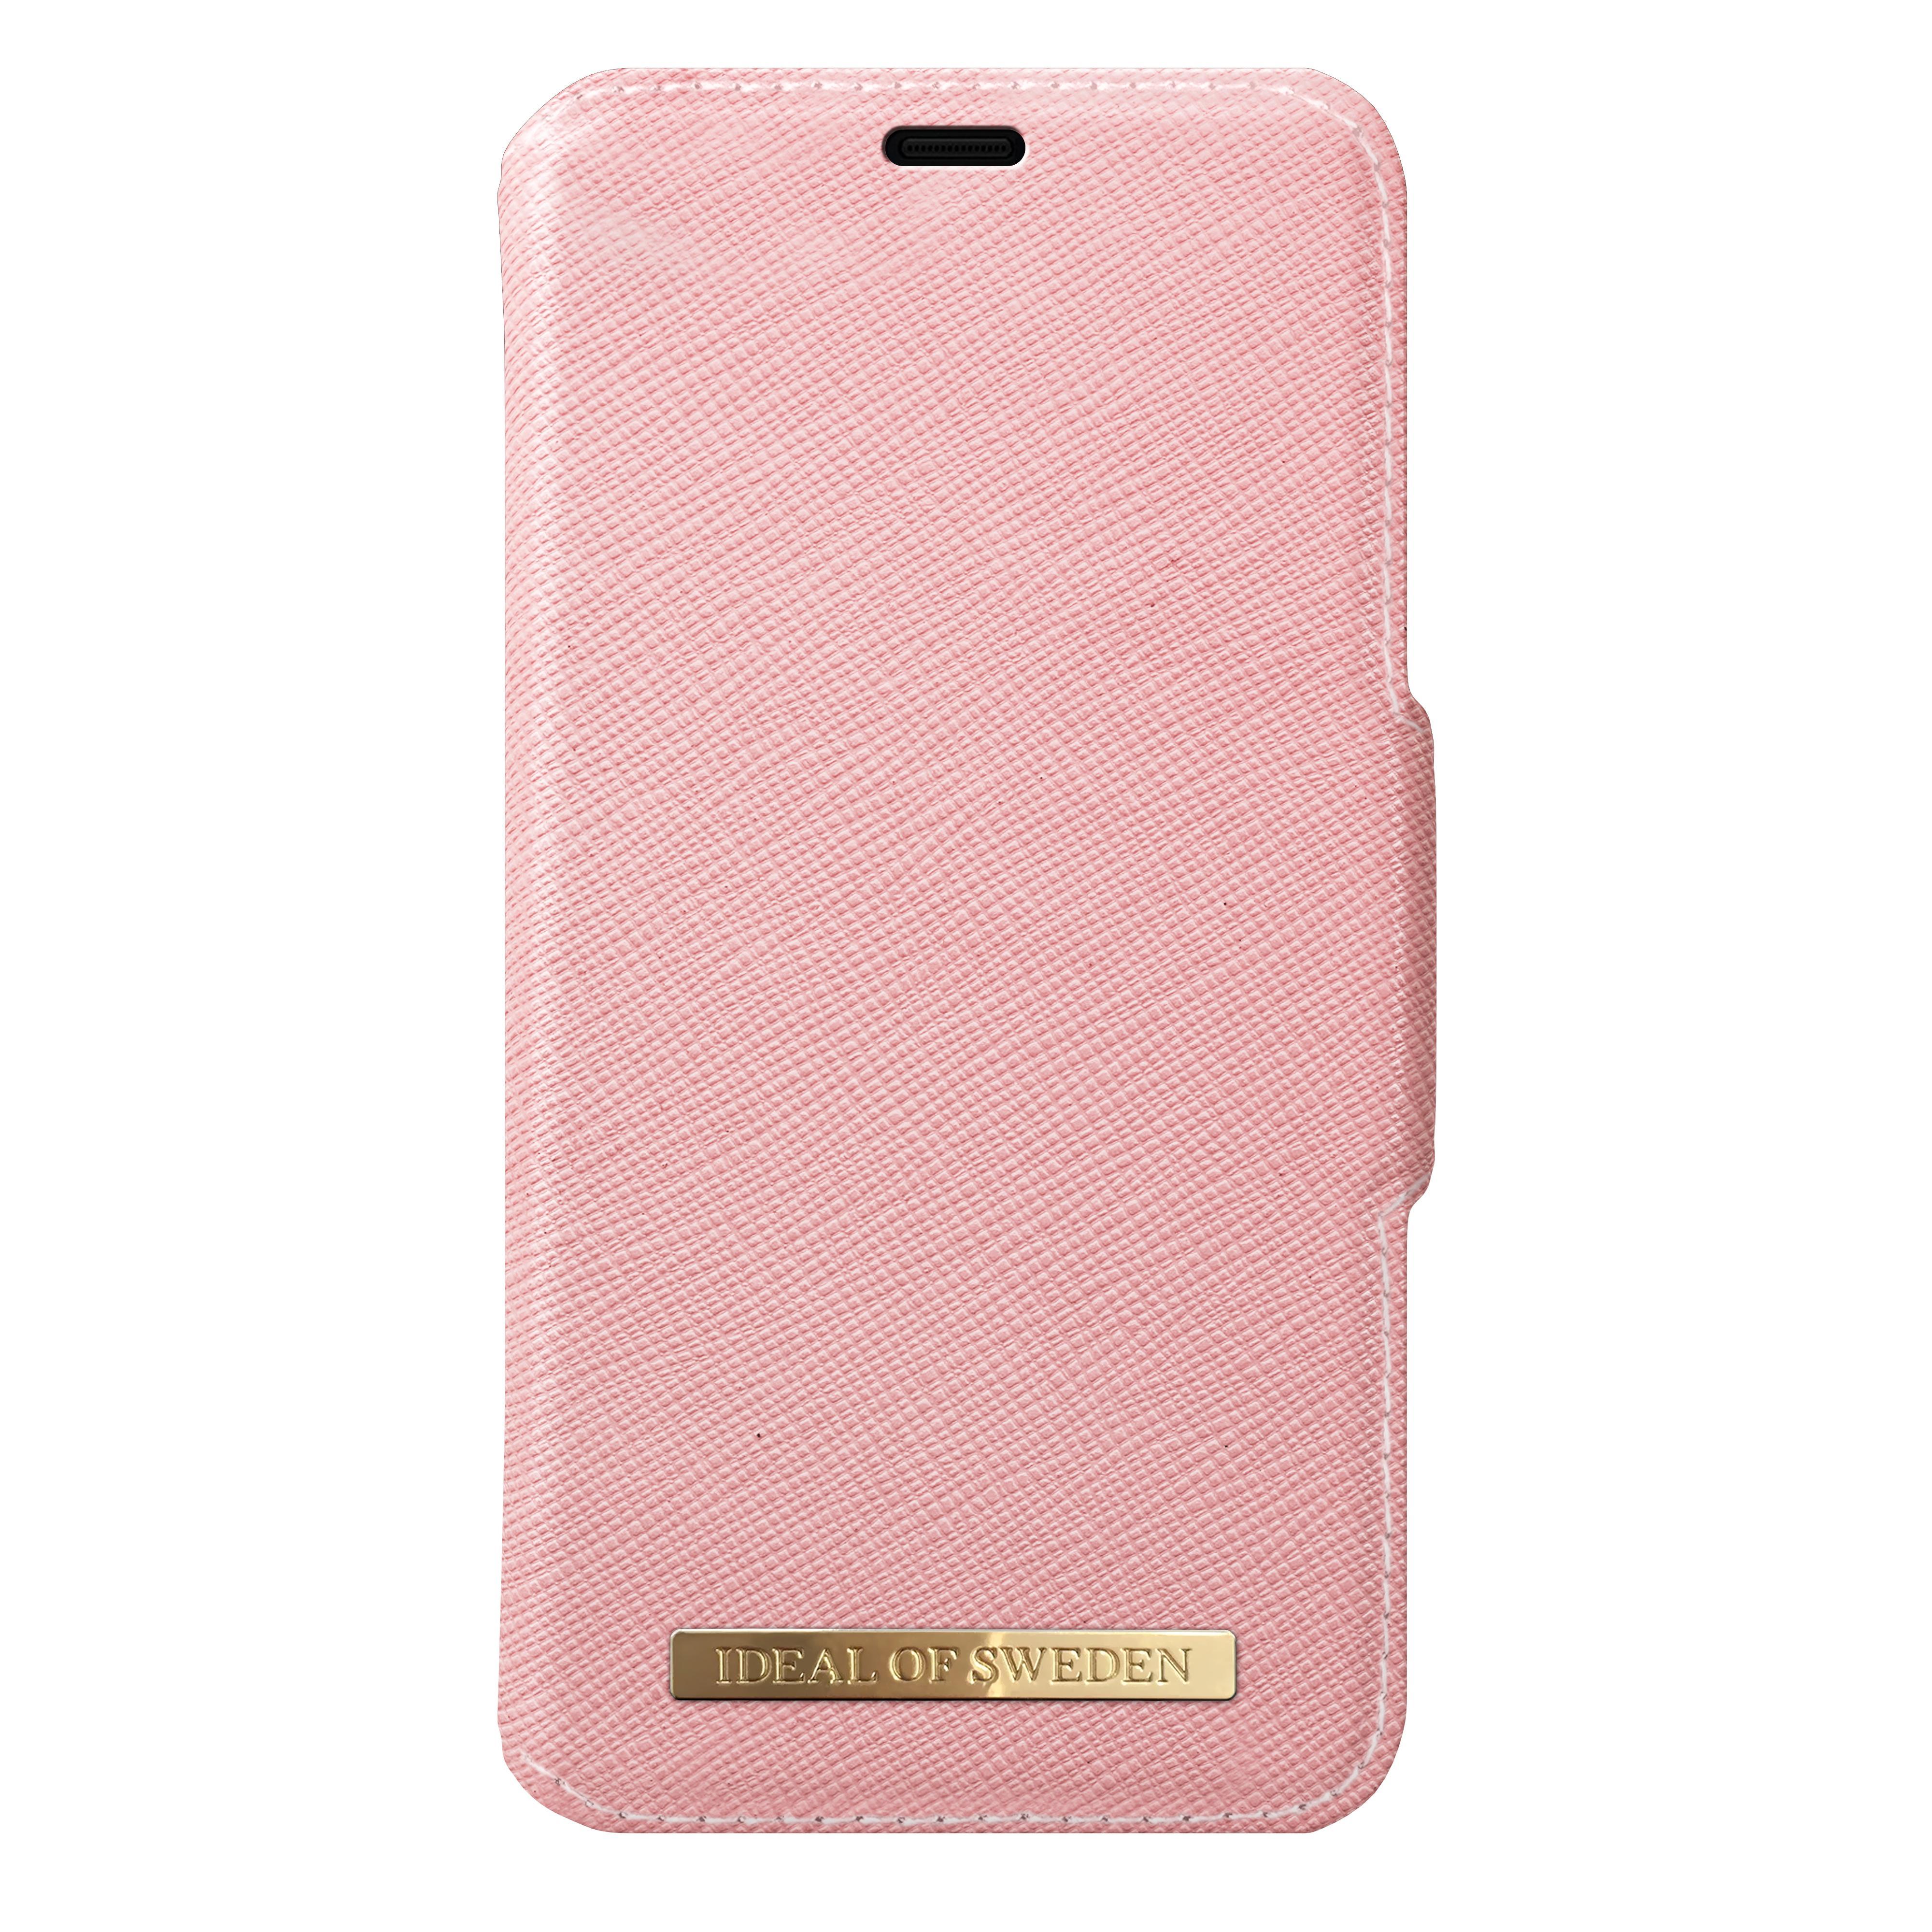 Fashion Wallet Galaxy S10 Plus Pink